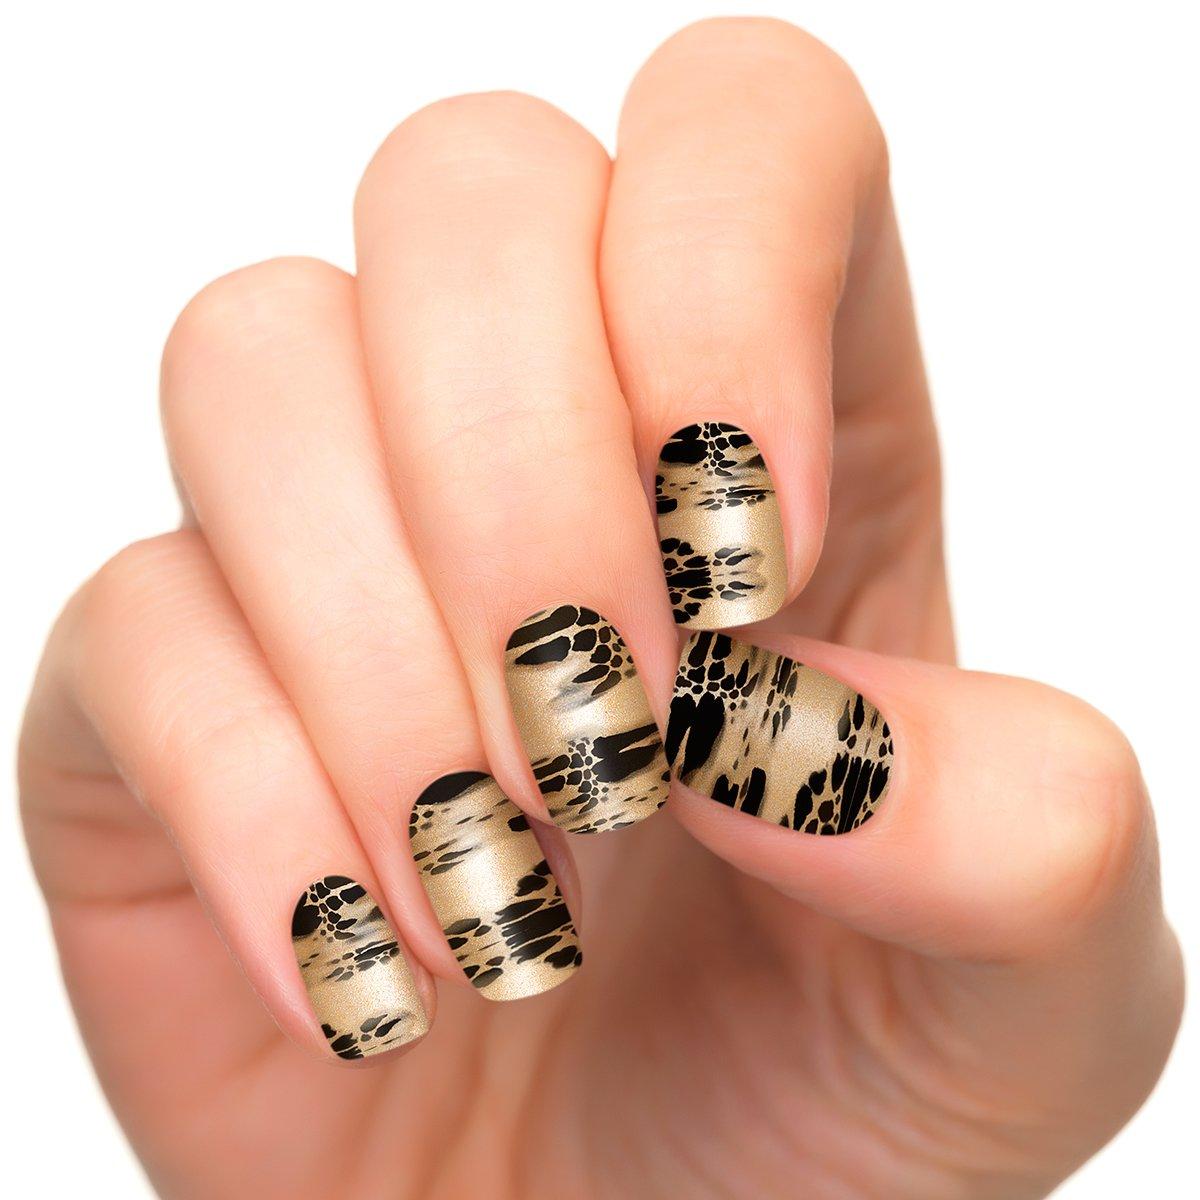 Incoco Nail Polish Strips, Nail Art, On the Prowl